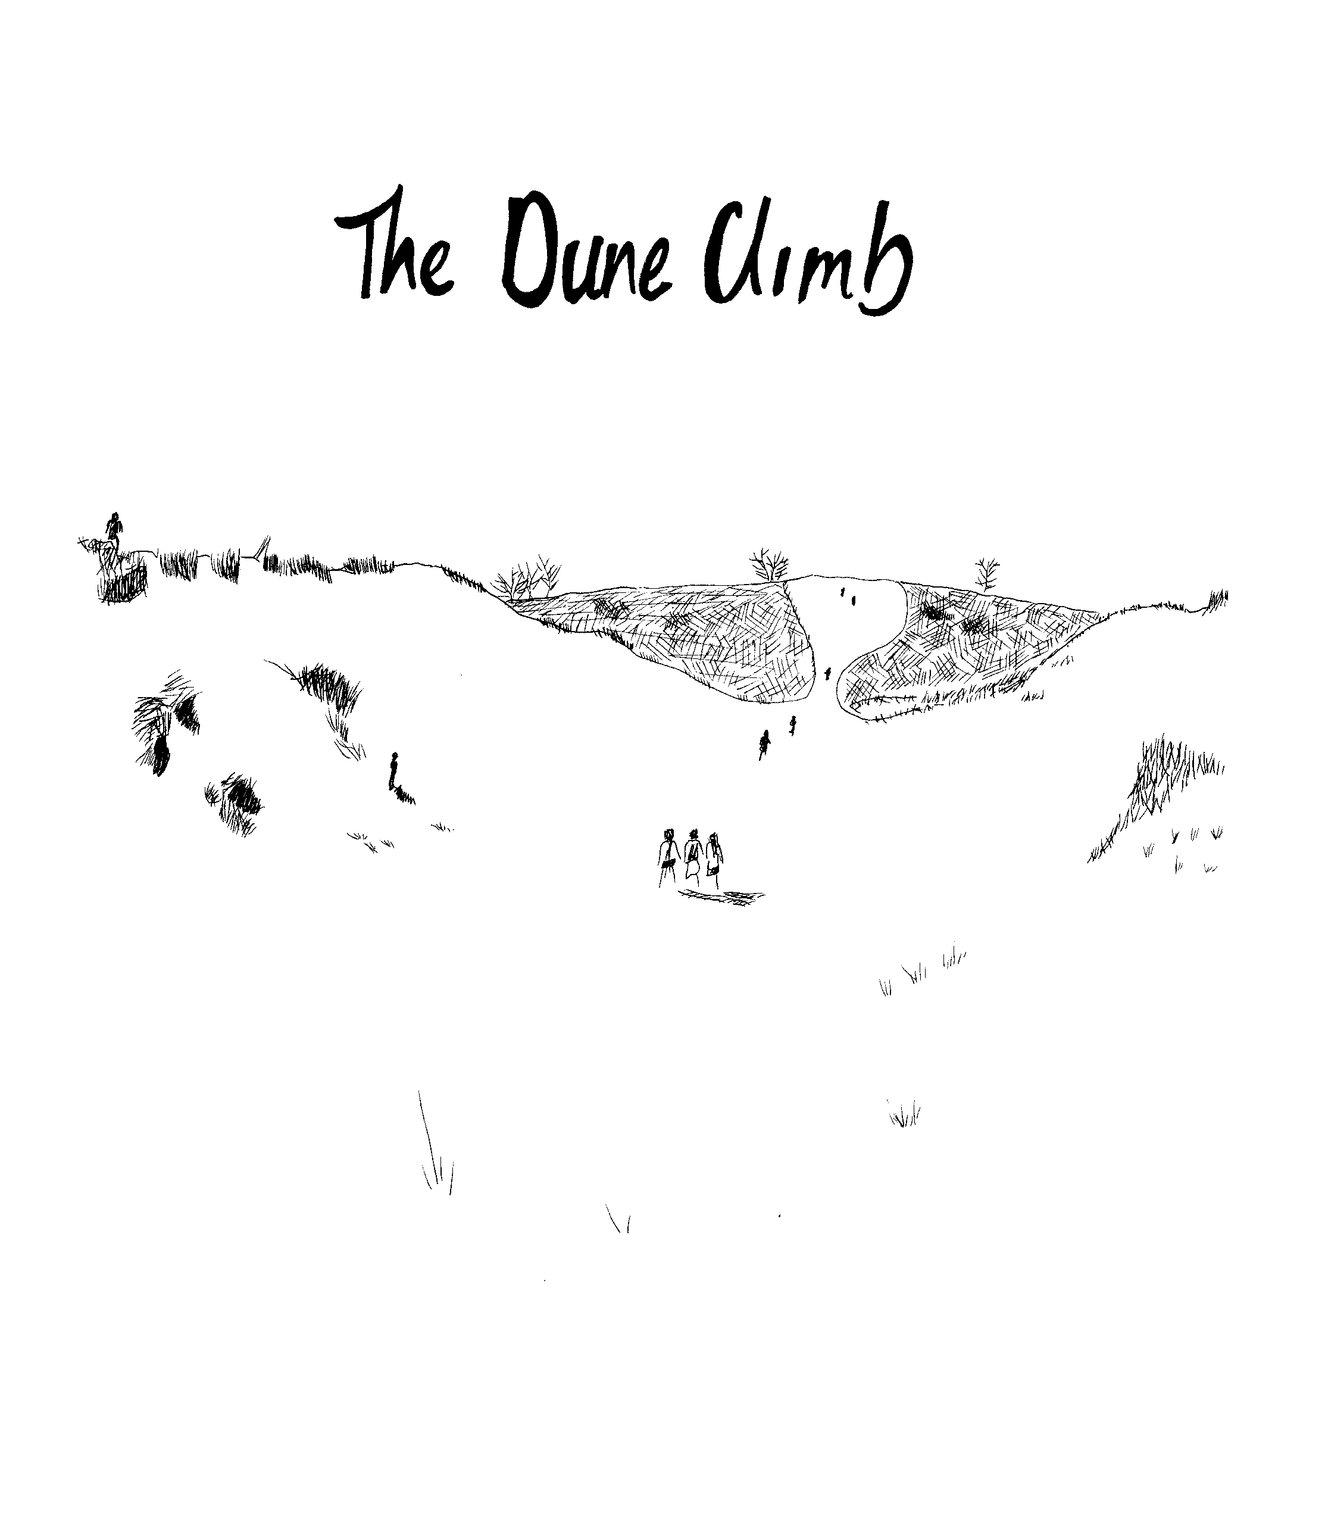 the dune climb - sleeping bear dunes Michigan - rebecca mir grady